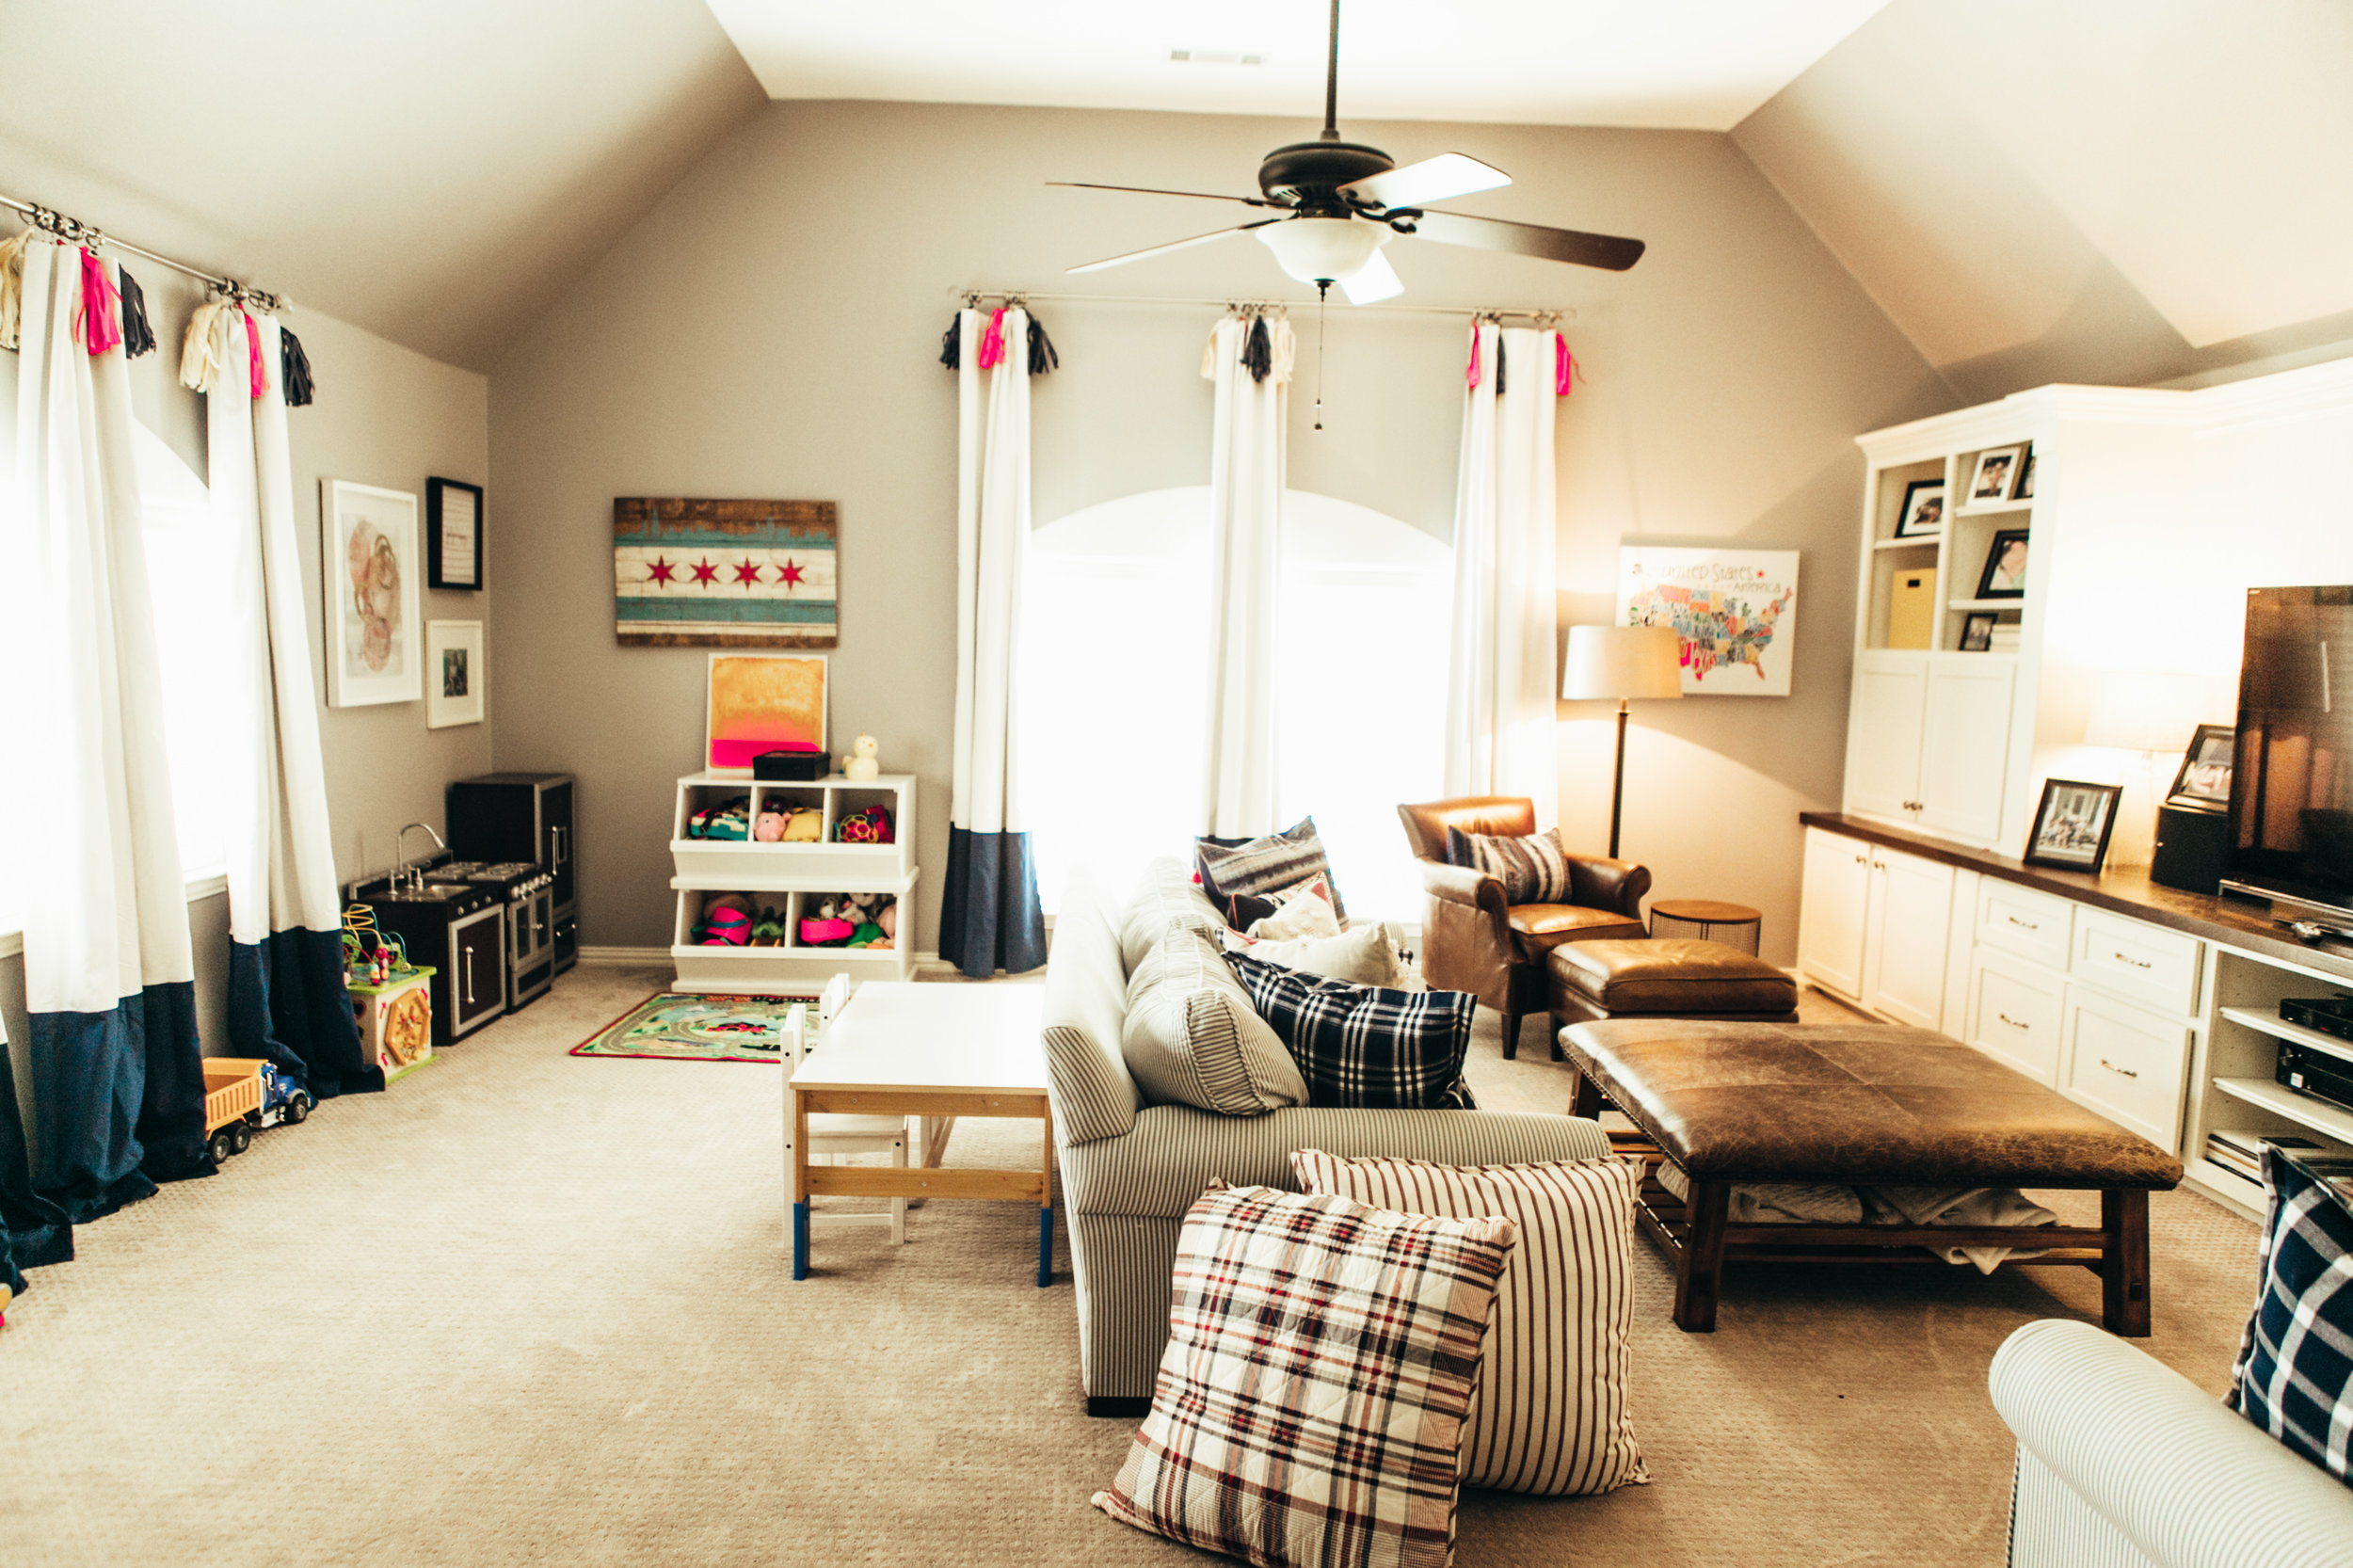 Playroom Interior Design 7.jpg